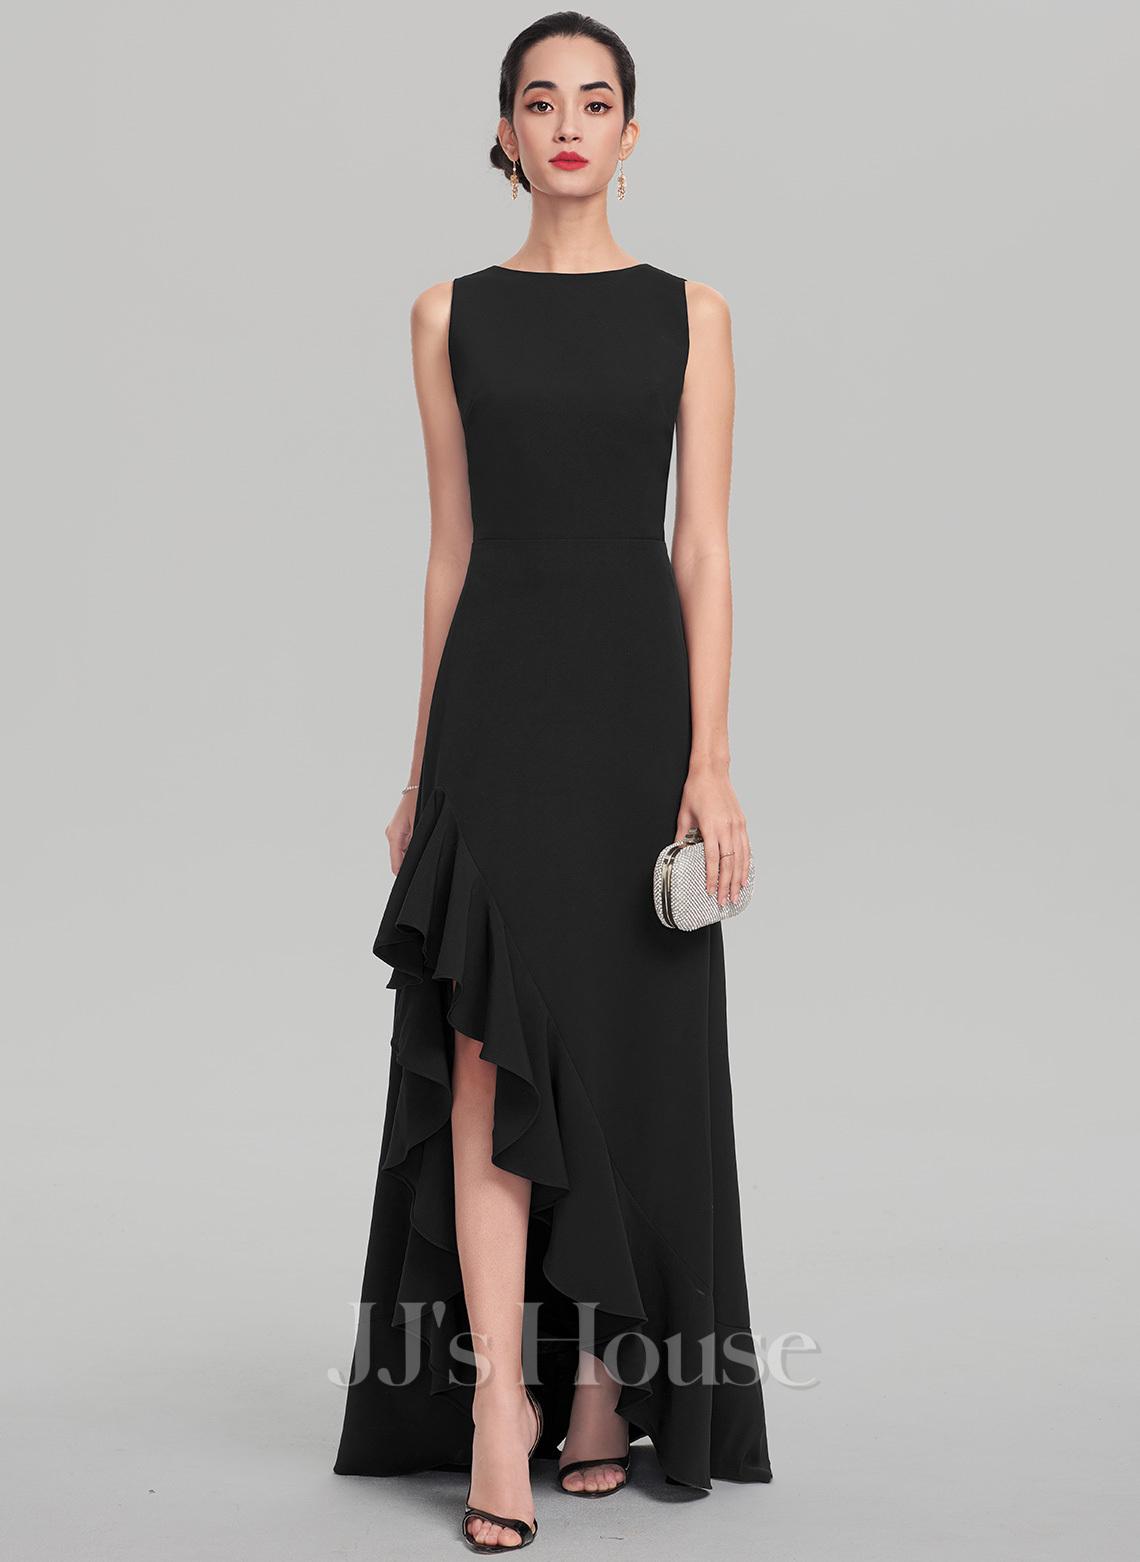 A-Line Scoop Neck Asymmetrical Stretch Crepe Evening Dress With Cascading Ruffles